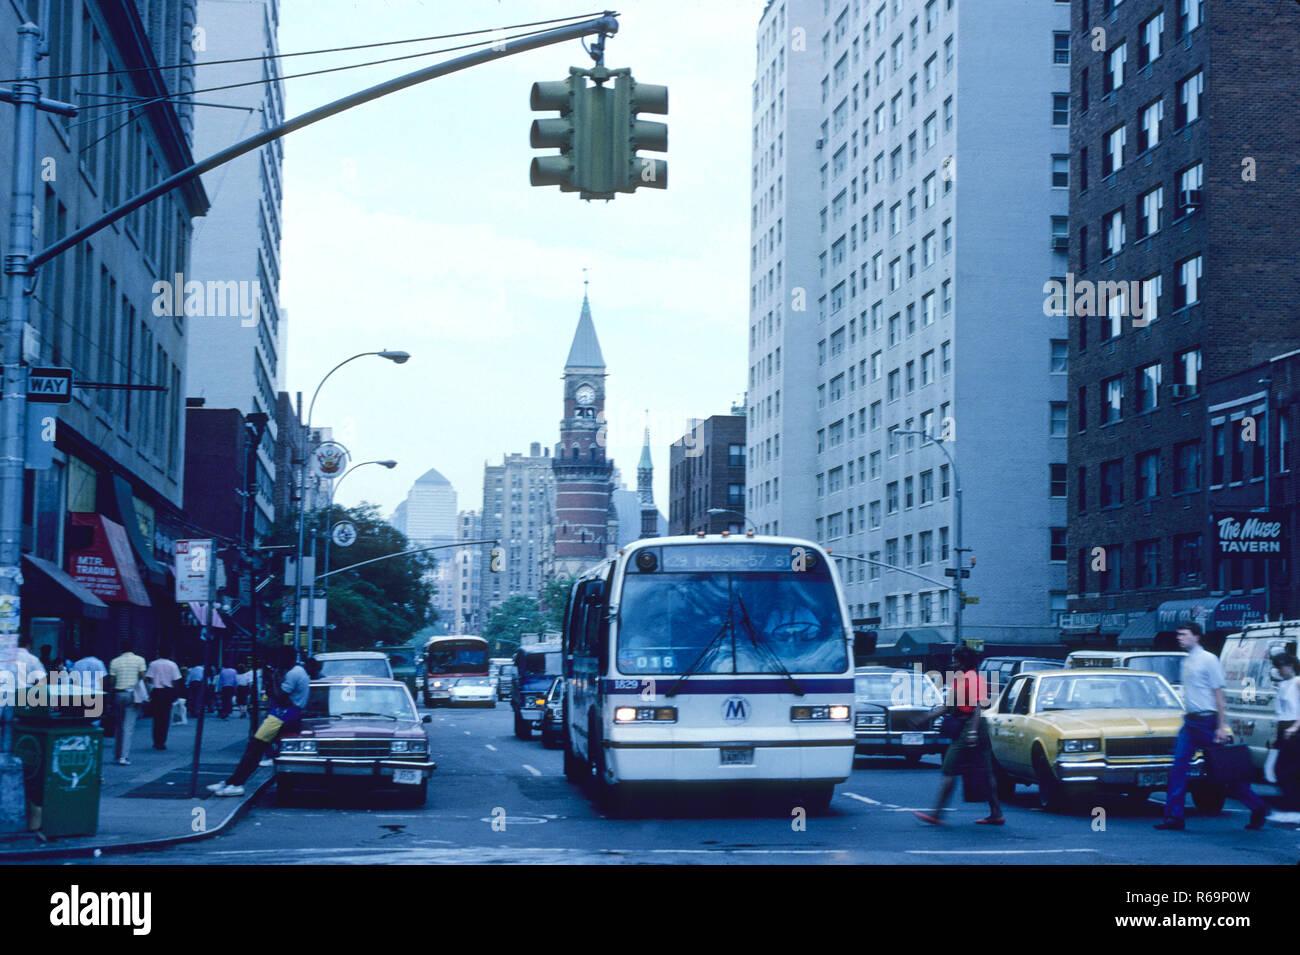 New York, U.S.A. - Stock Image